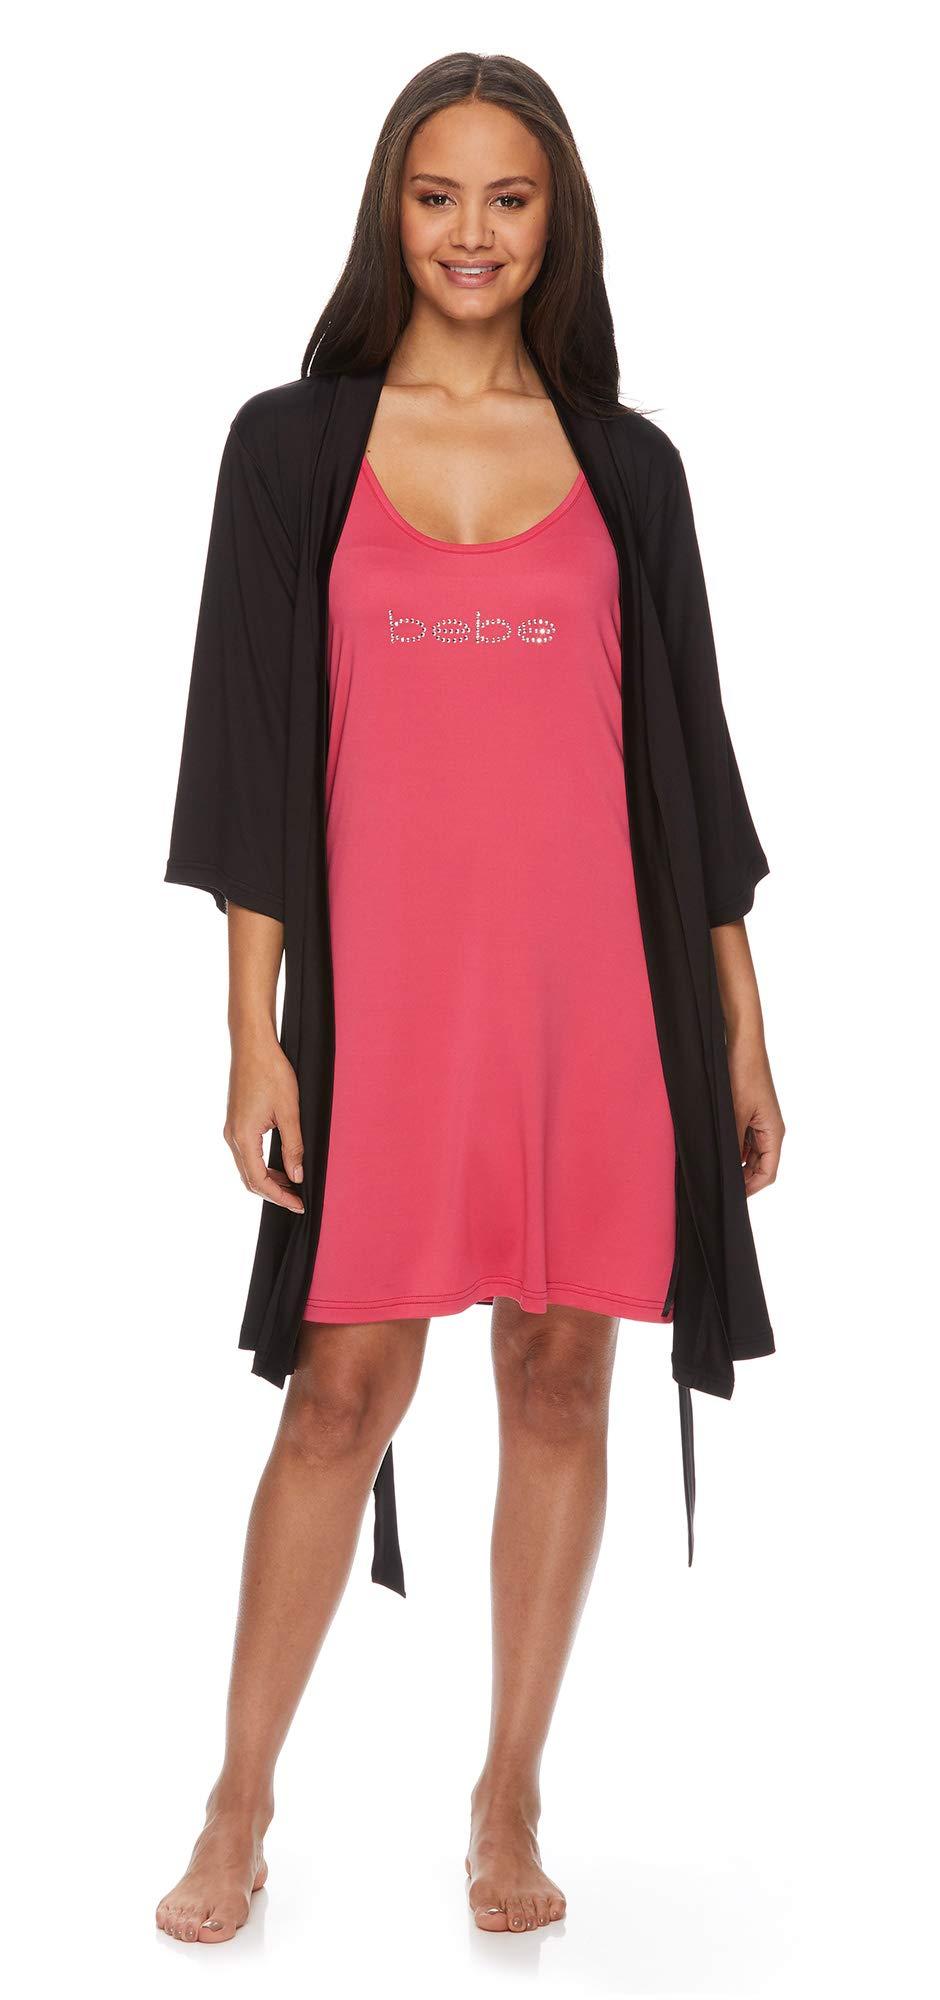 bebe Womens Nightgowns Lace Trim Chemise Lounge & Belted Wrap Pajama Robe Sleepwear Set